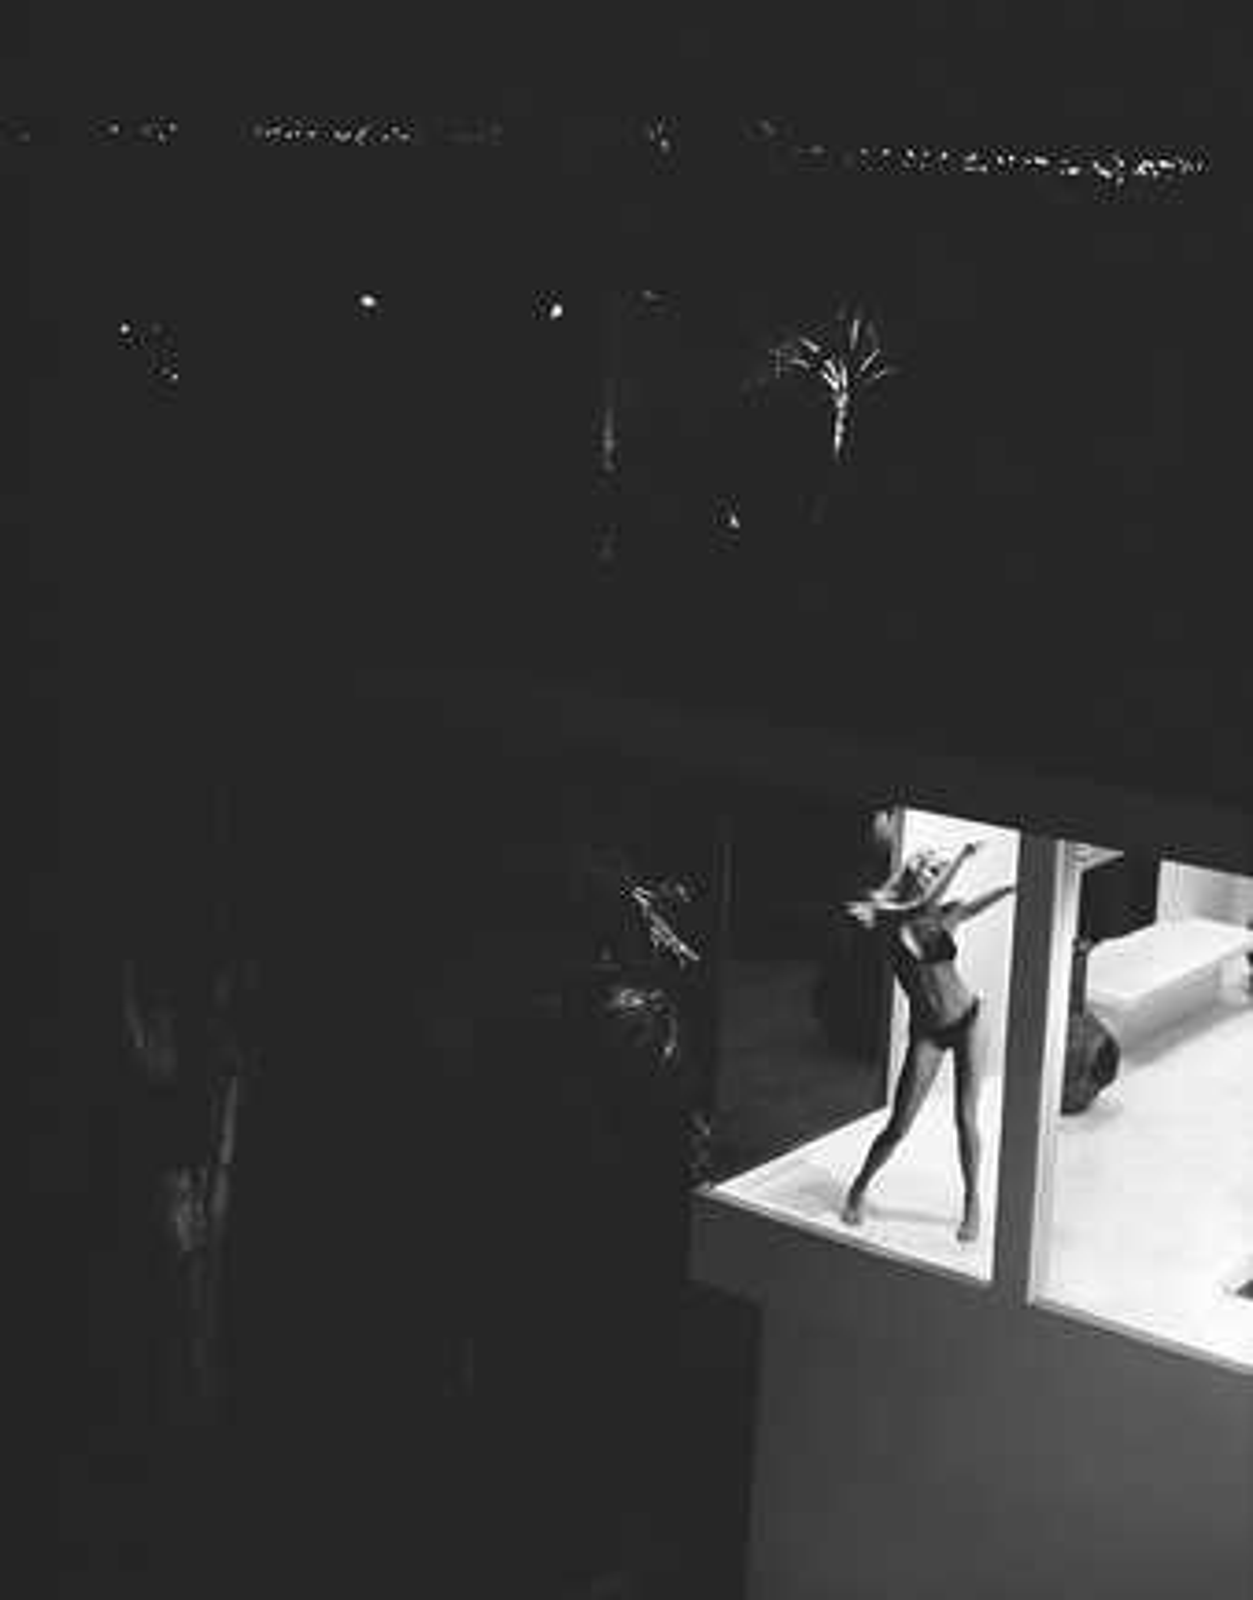 Night Dancing - Dewey Nicks | Trunk Archive